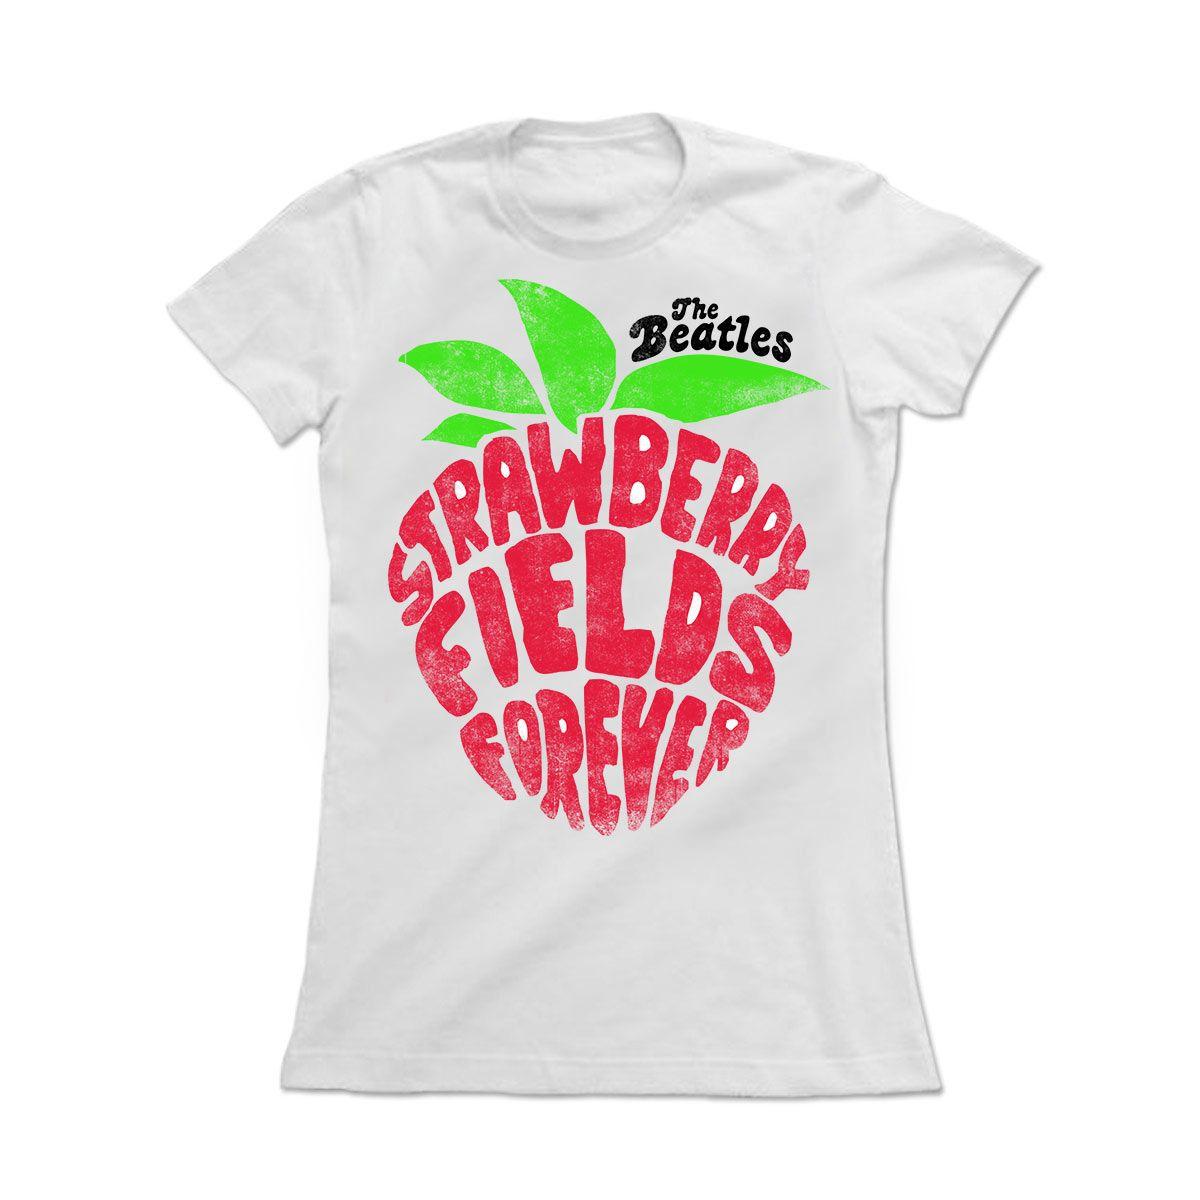 6db4be0277f Camiseta Feminina The Beatles - Strawberry Fields Forever | The ...